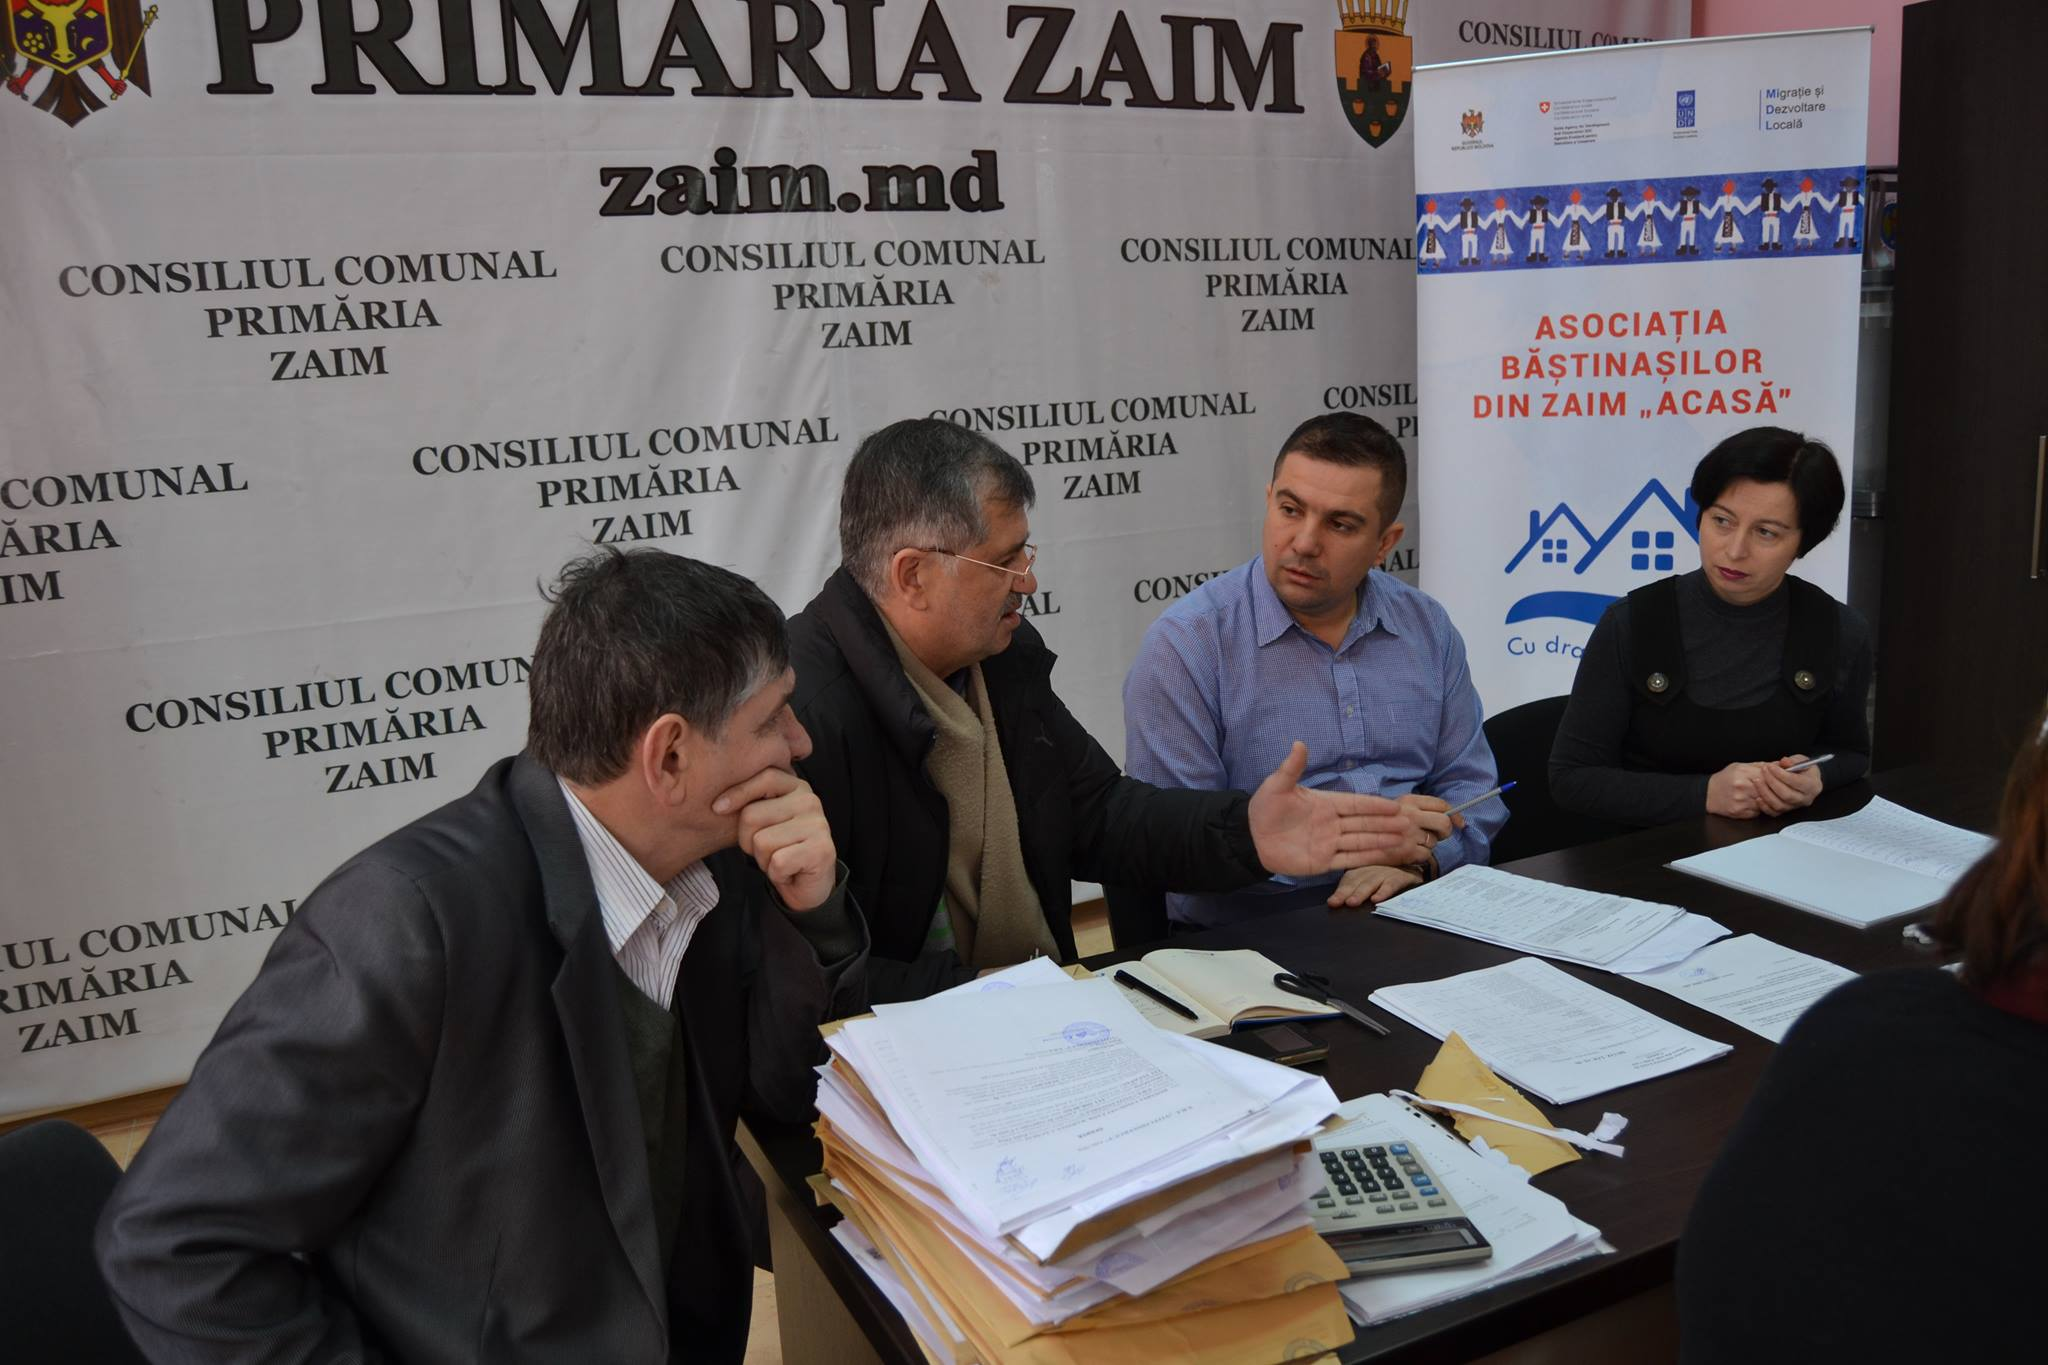 Ședința Consiliului comunal Zaim, 08.12.2017